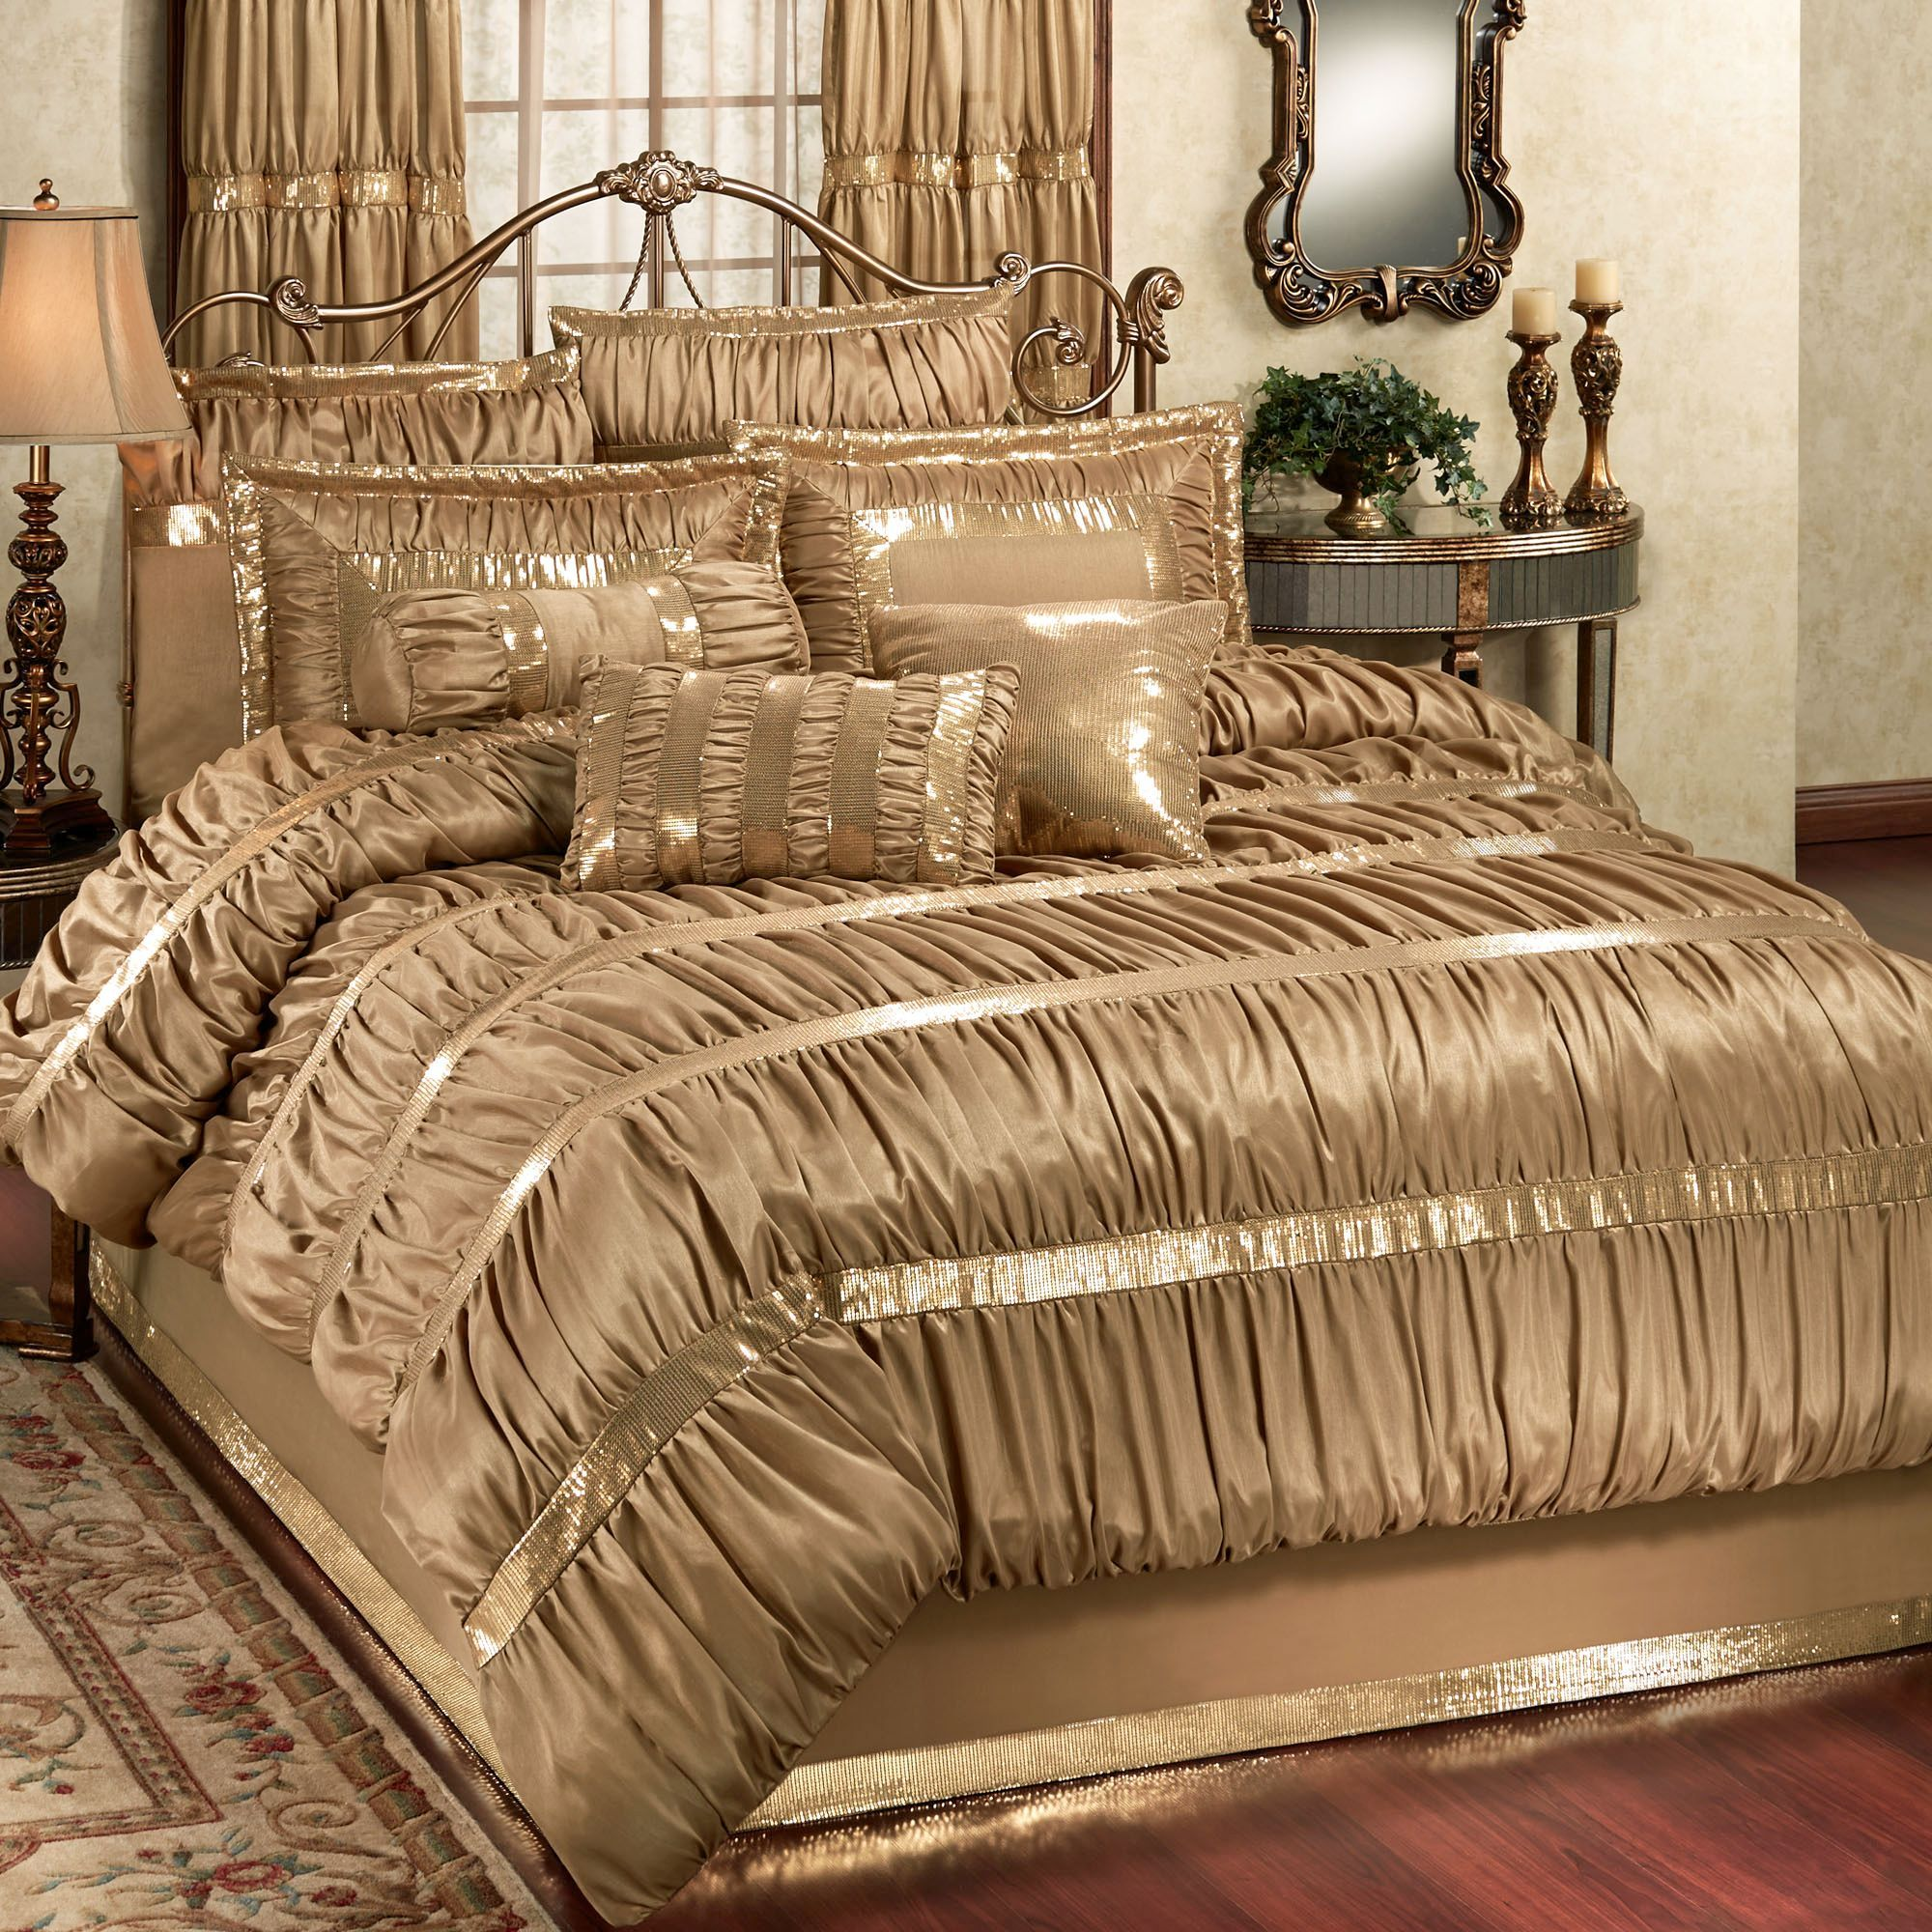 Black and gold queen comforter set - Splendor Shirred Faux Silk Dark Gold Comforter Bedding